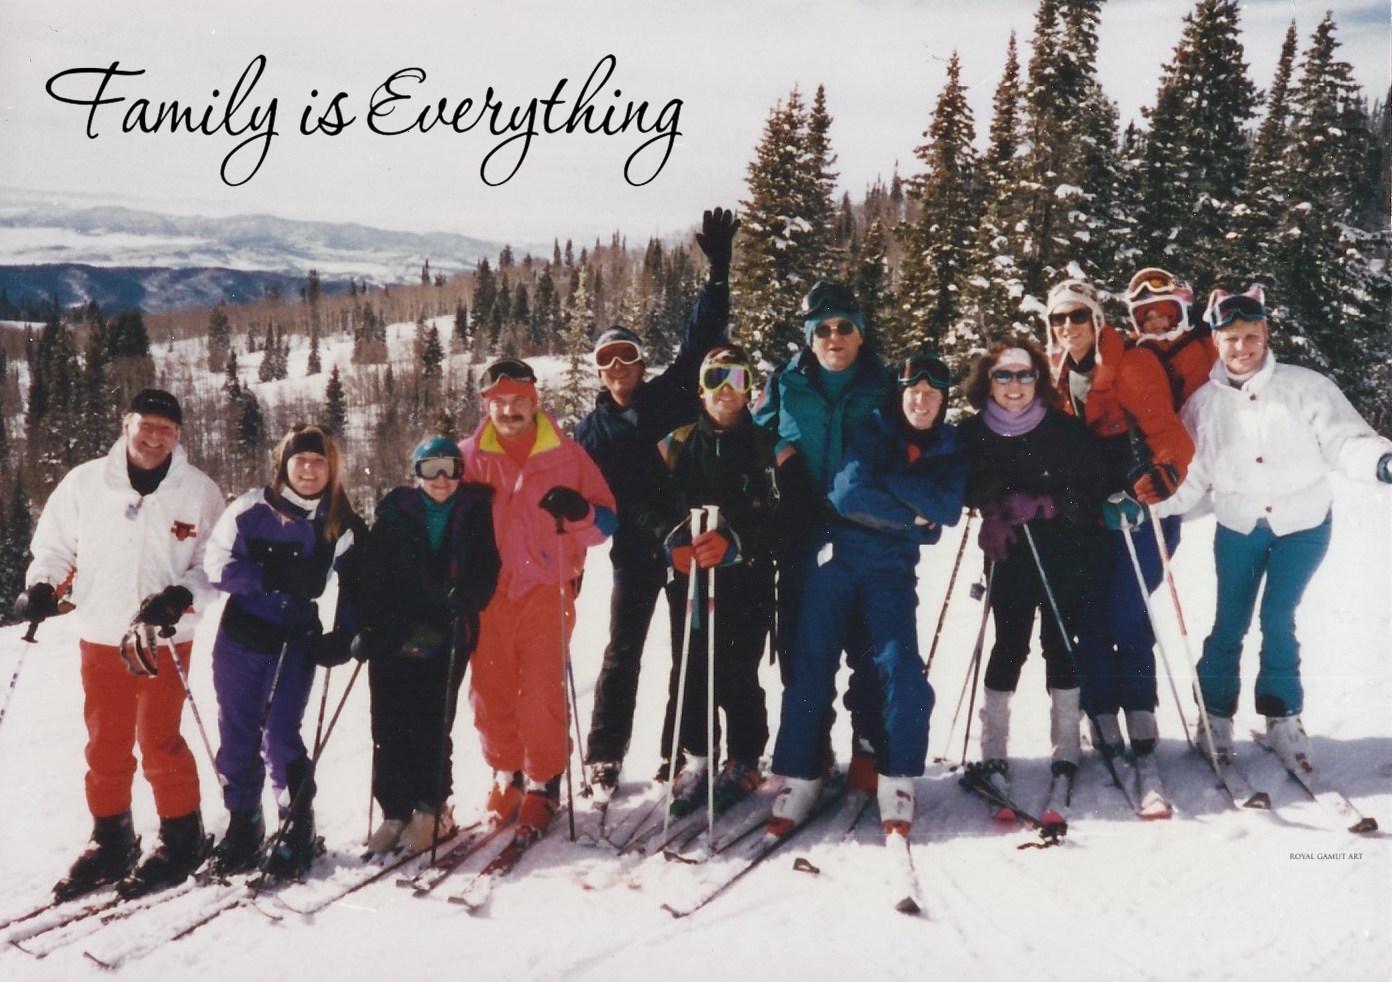 Stalmack Family skiing Storm Peak Steamboat Springs CO